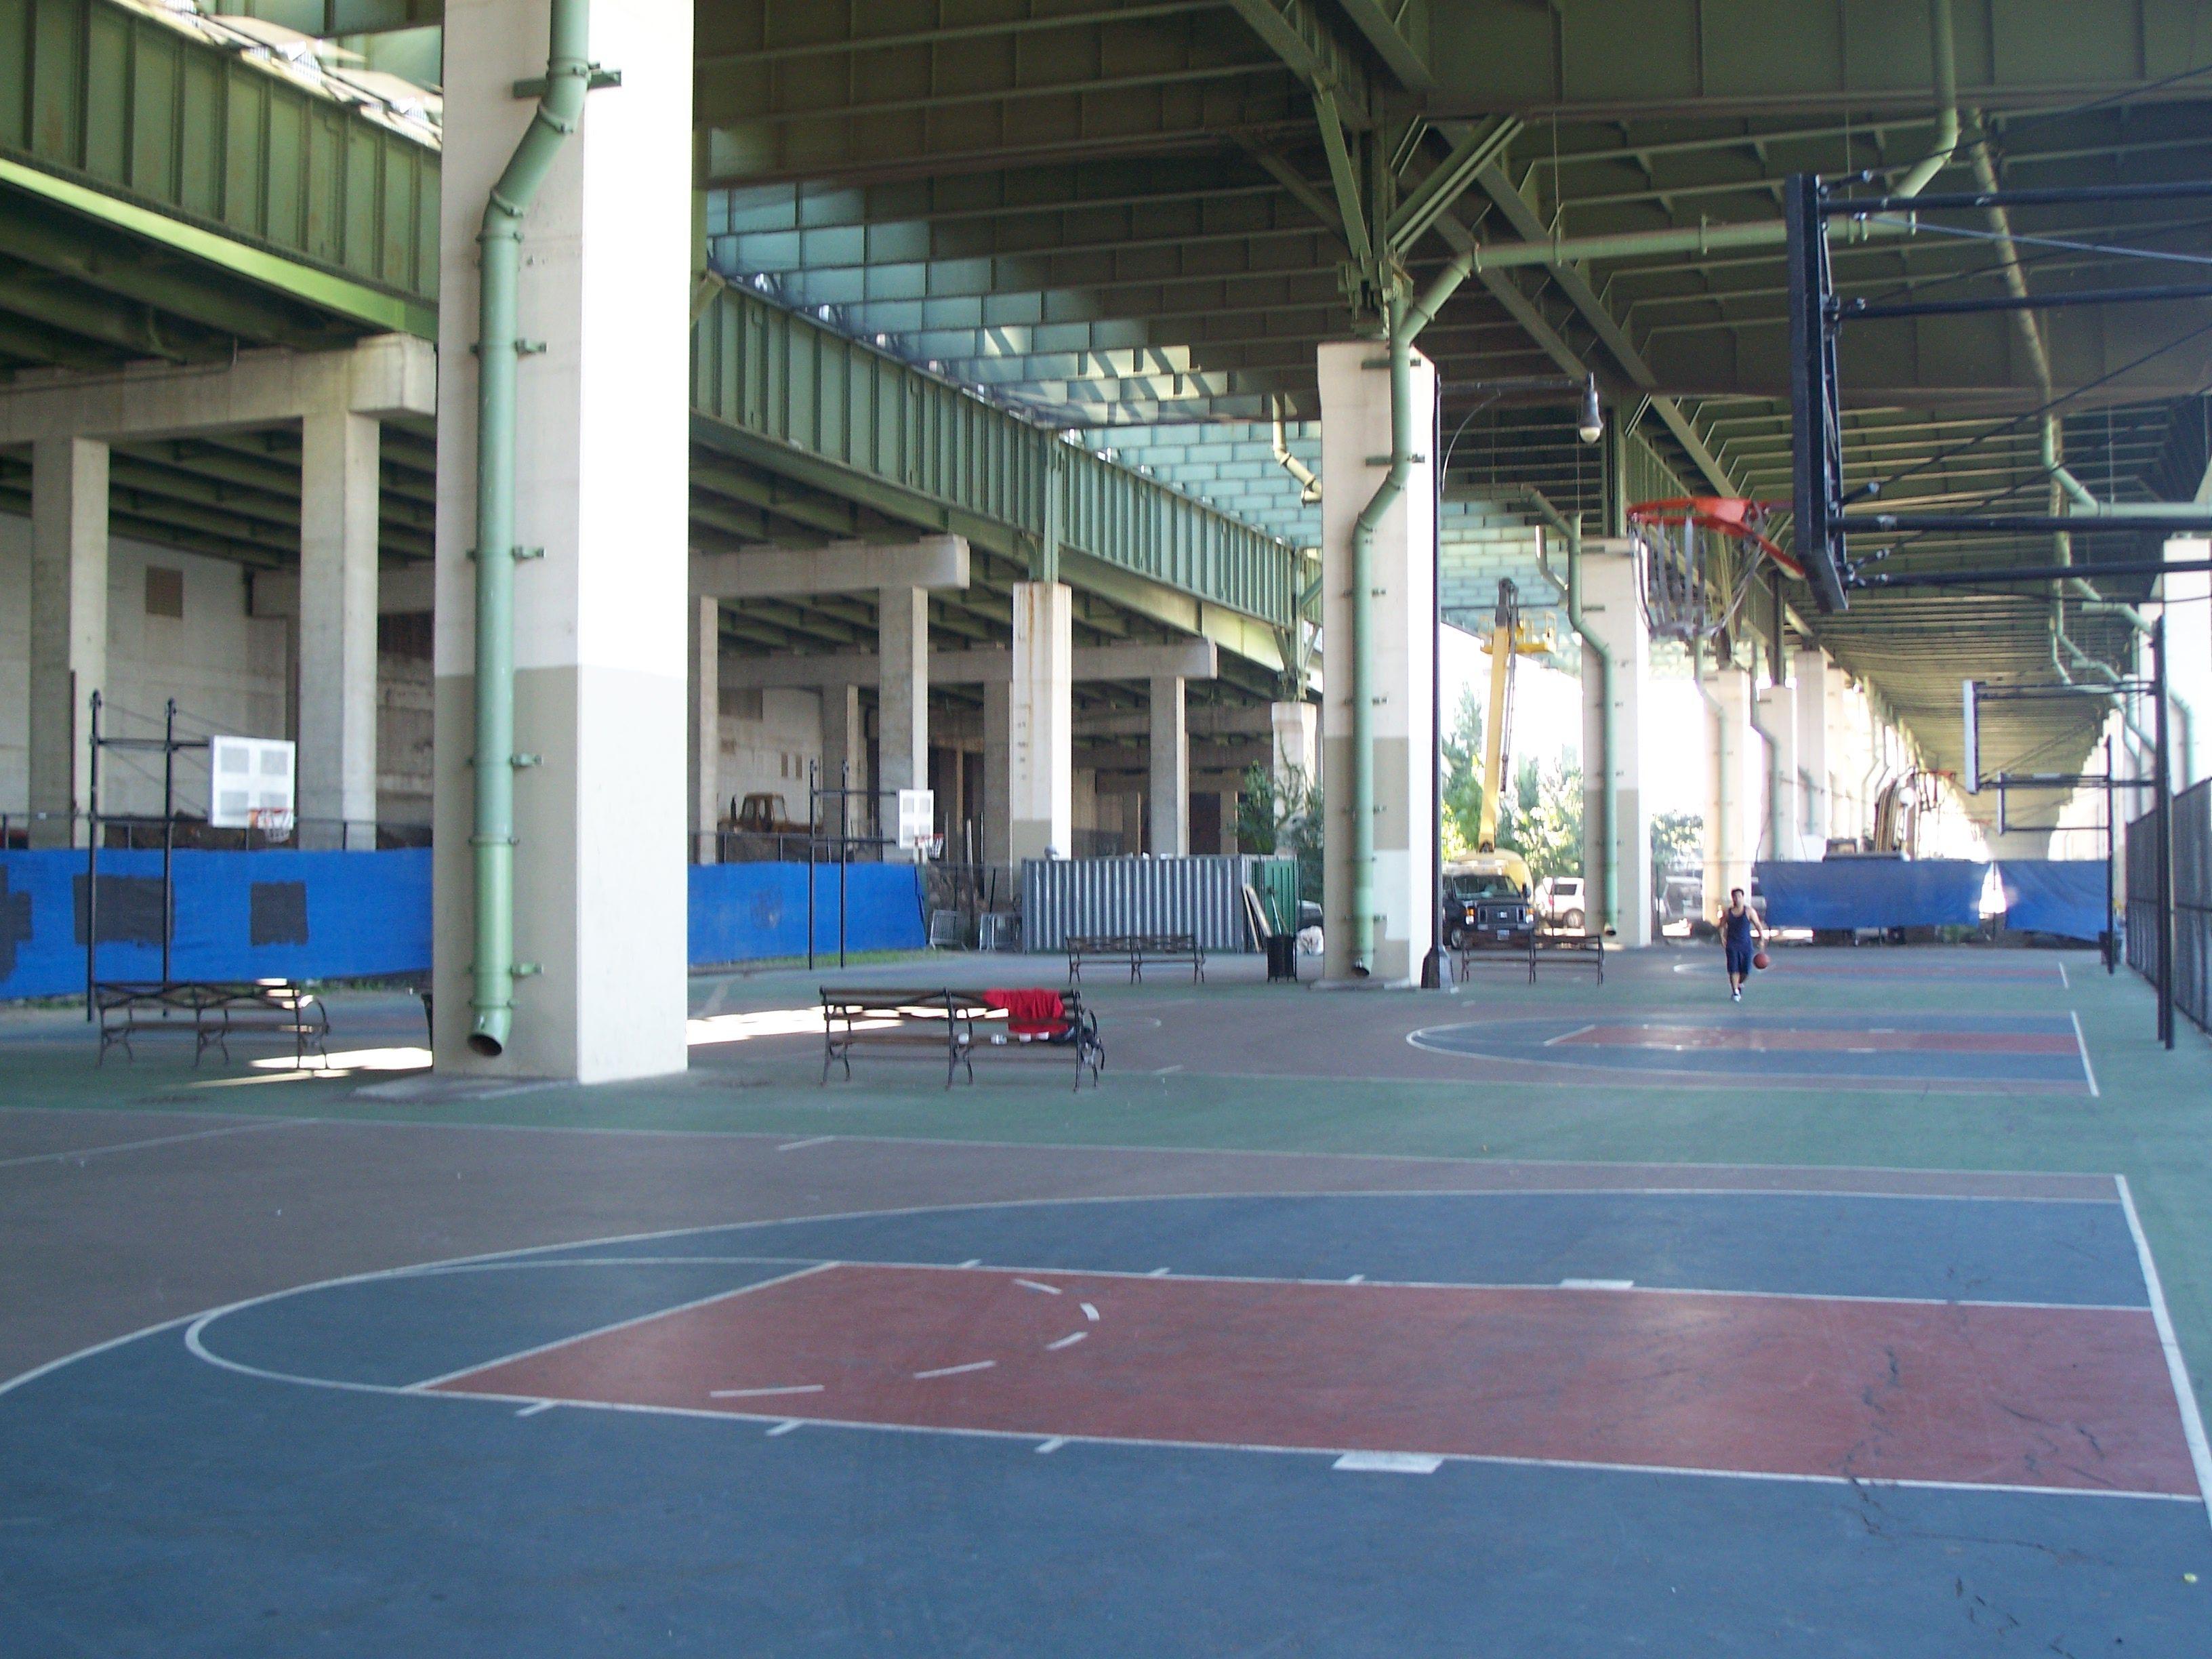 Images For Street Basketball Court Basketball Court Outdoor Basketball Court Street Basketball